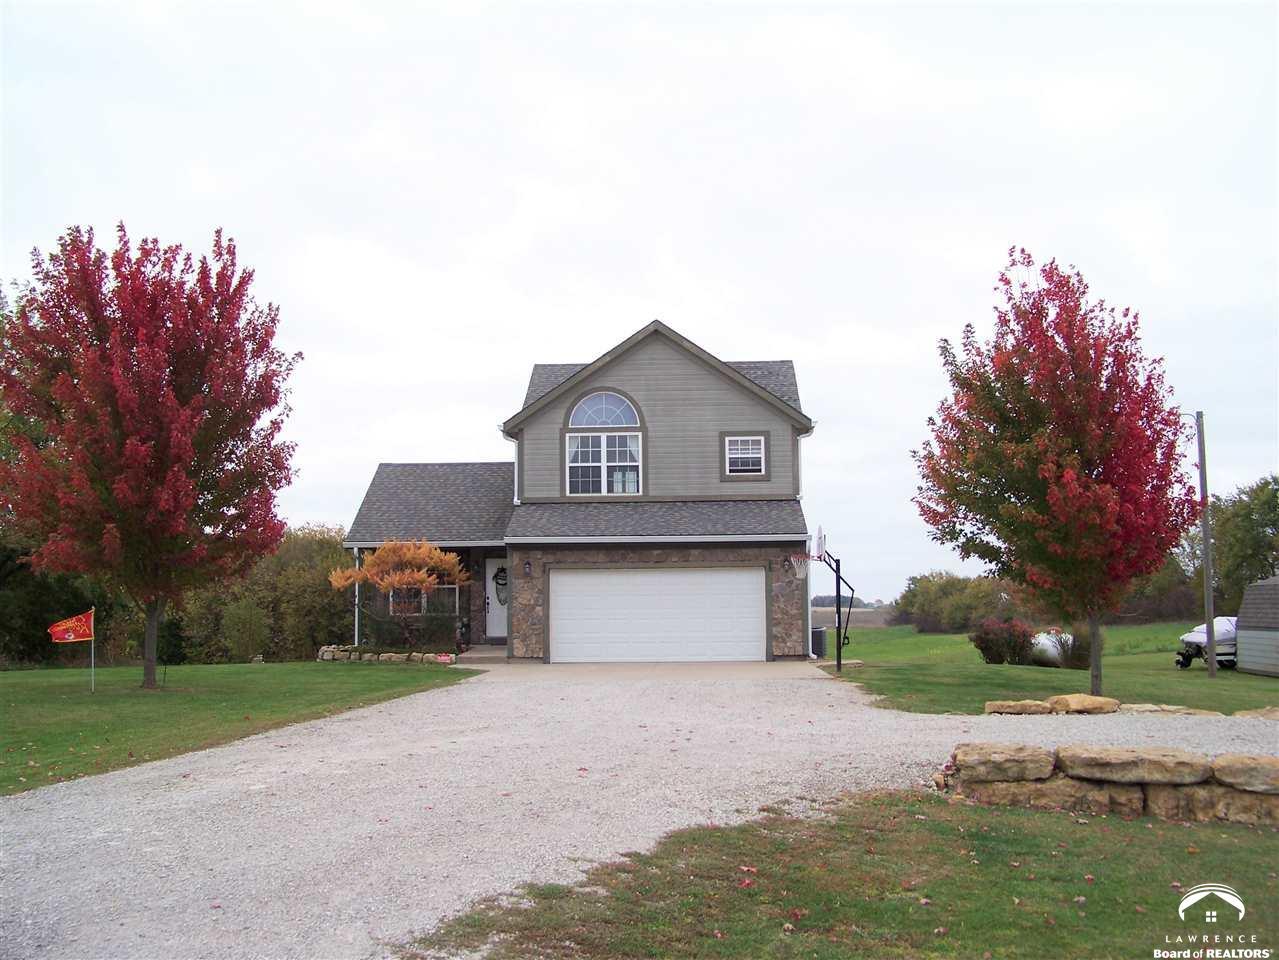 Lawrence ks homes for Appraisal value of unfinished basement